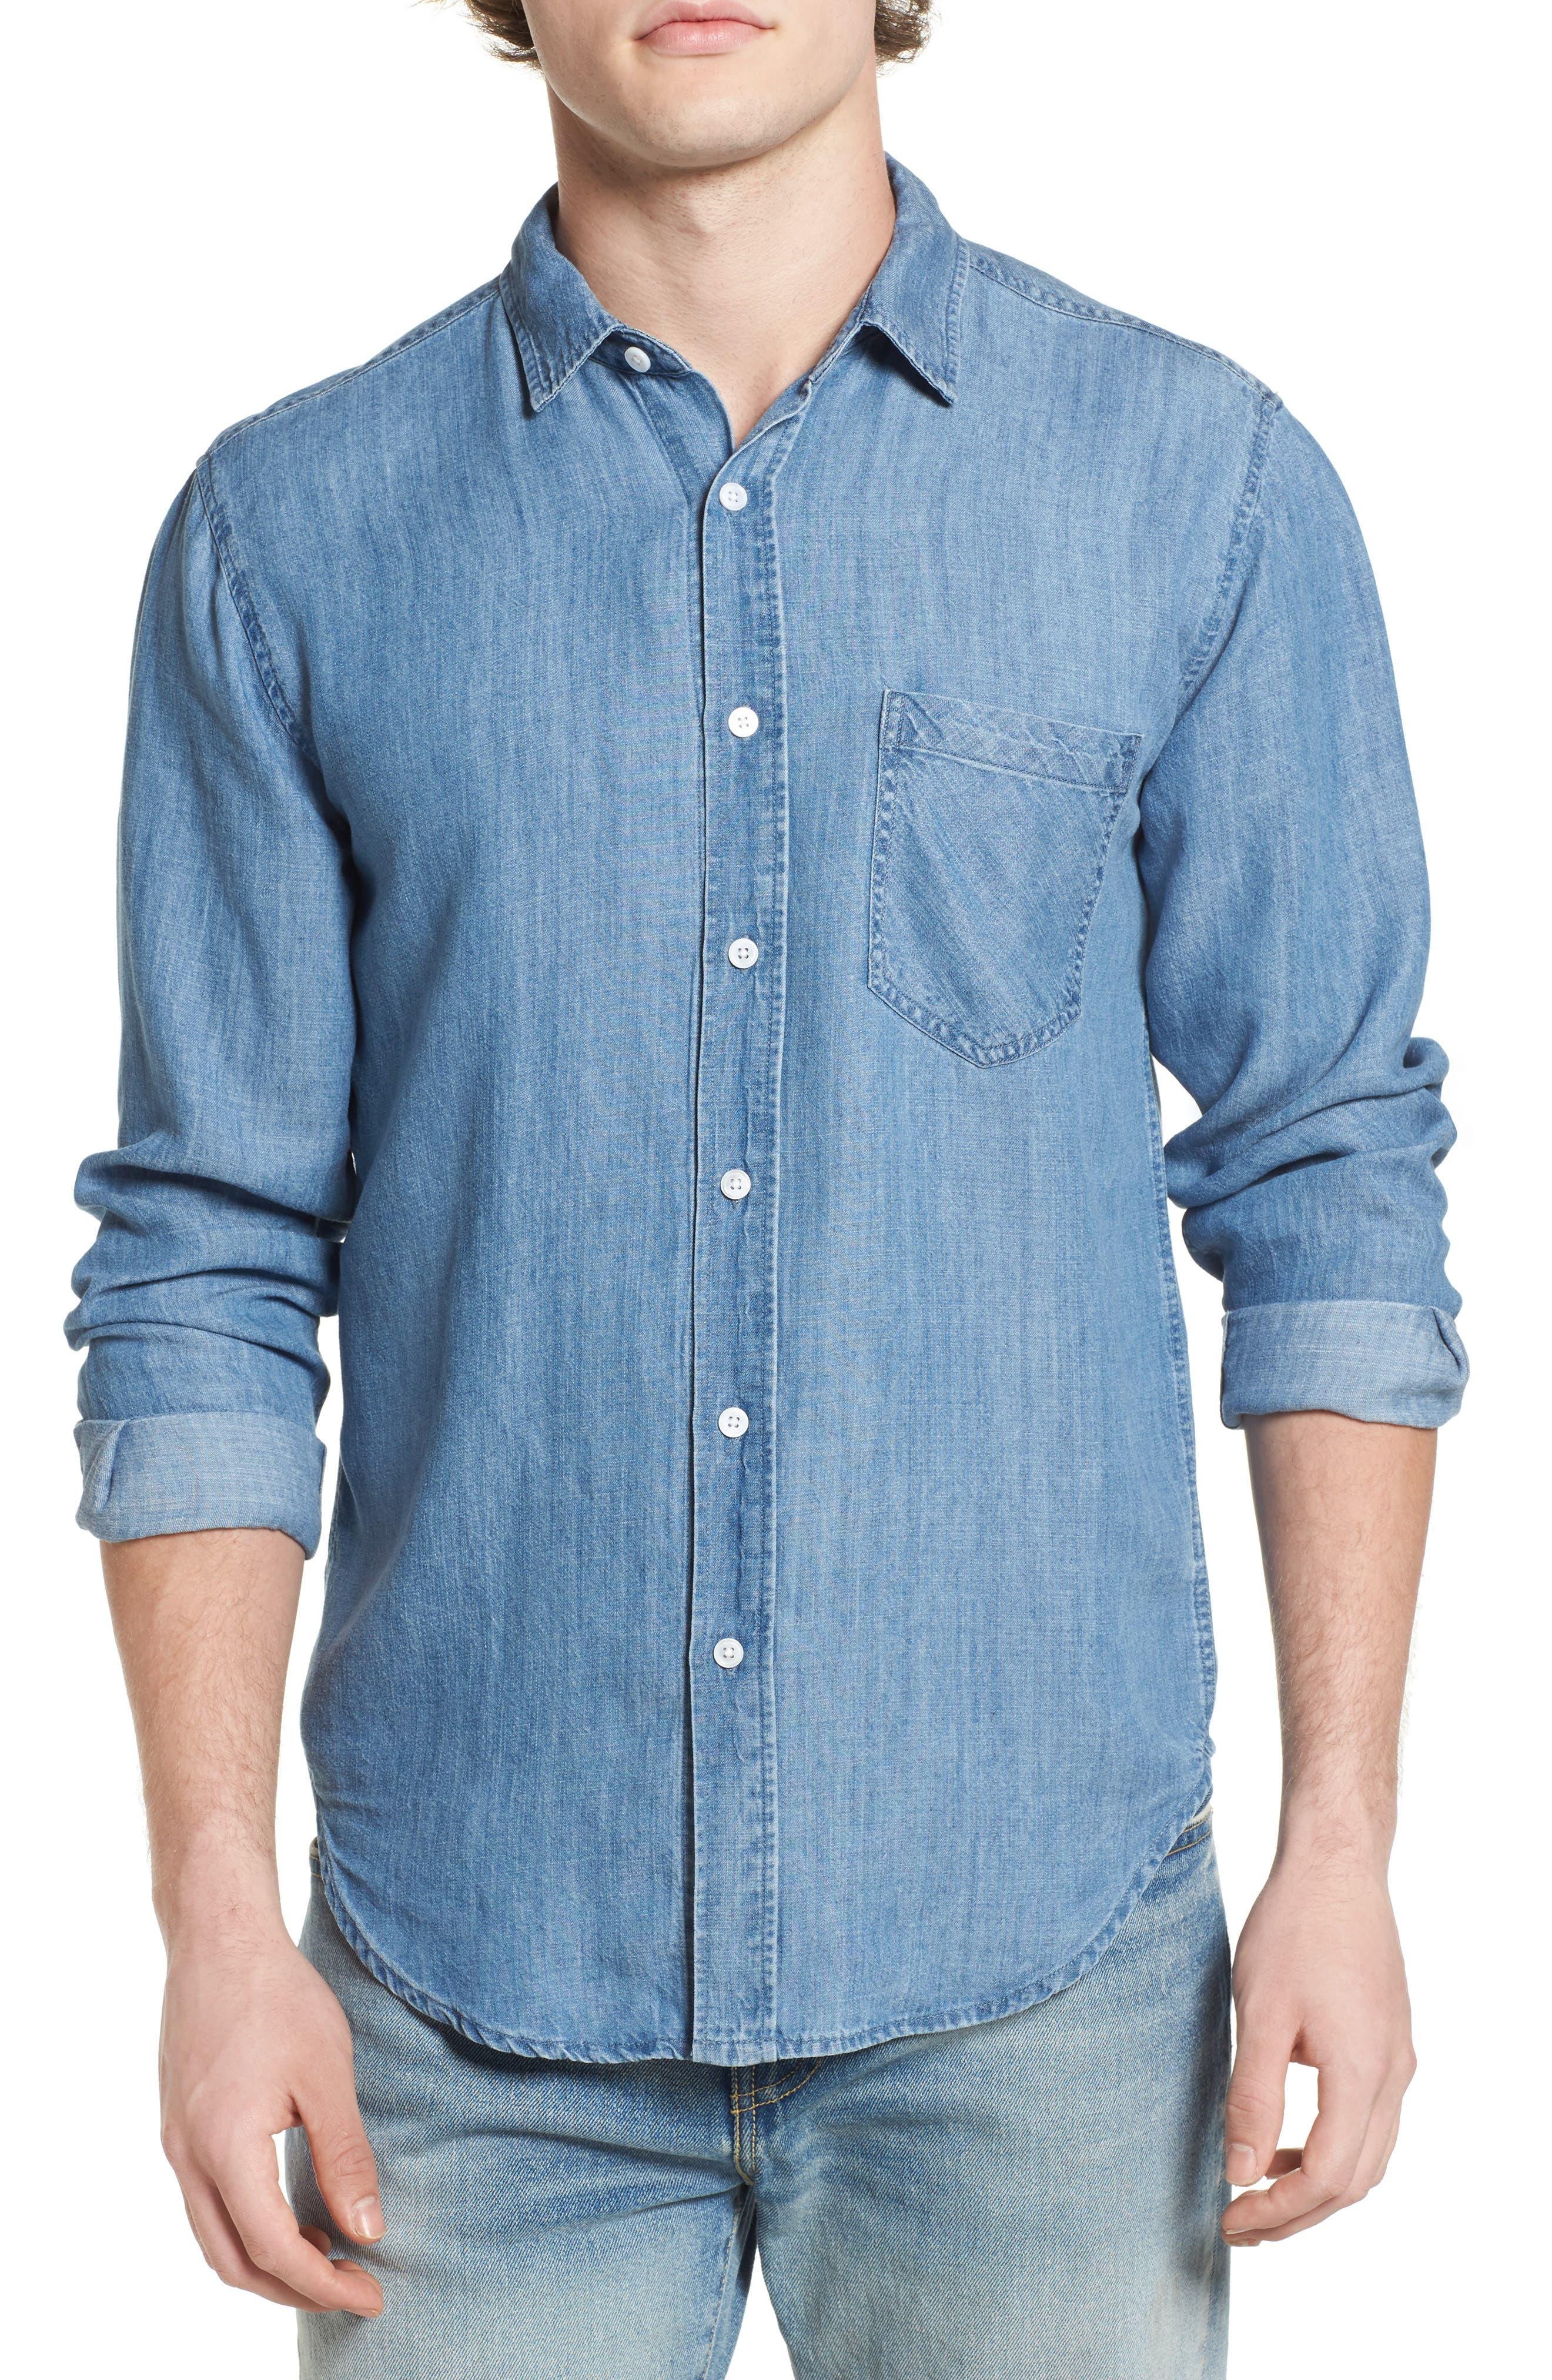 Colton Denim Shirt,                         Main,                         color, MEDIUM VINTAGE WASH